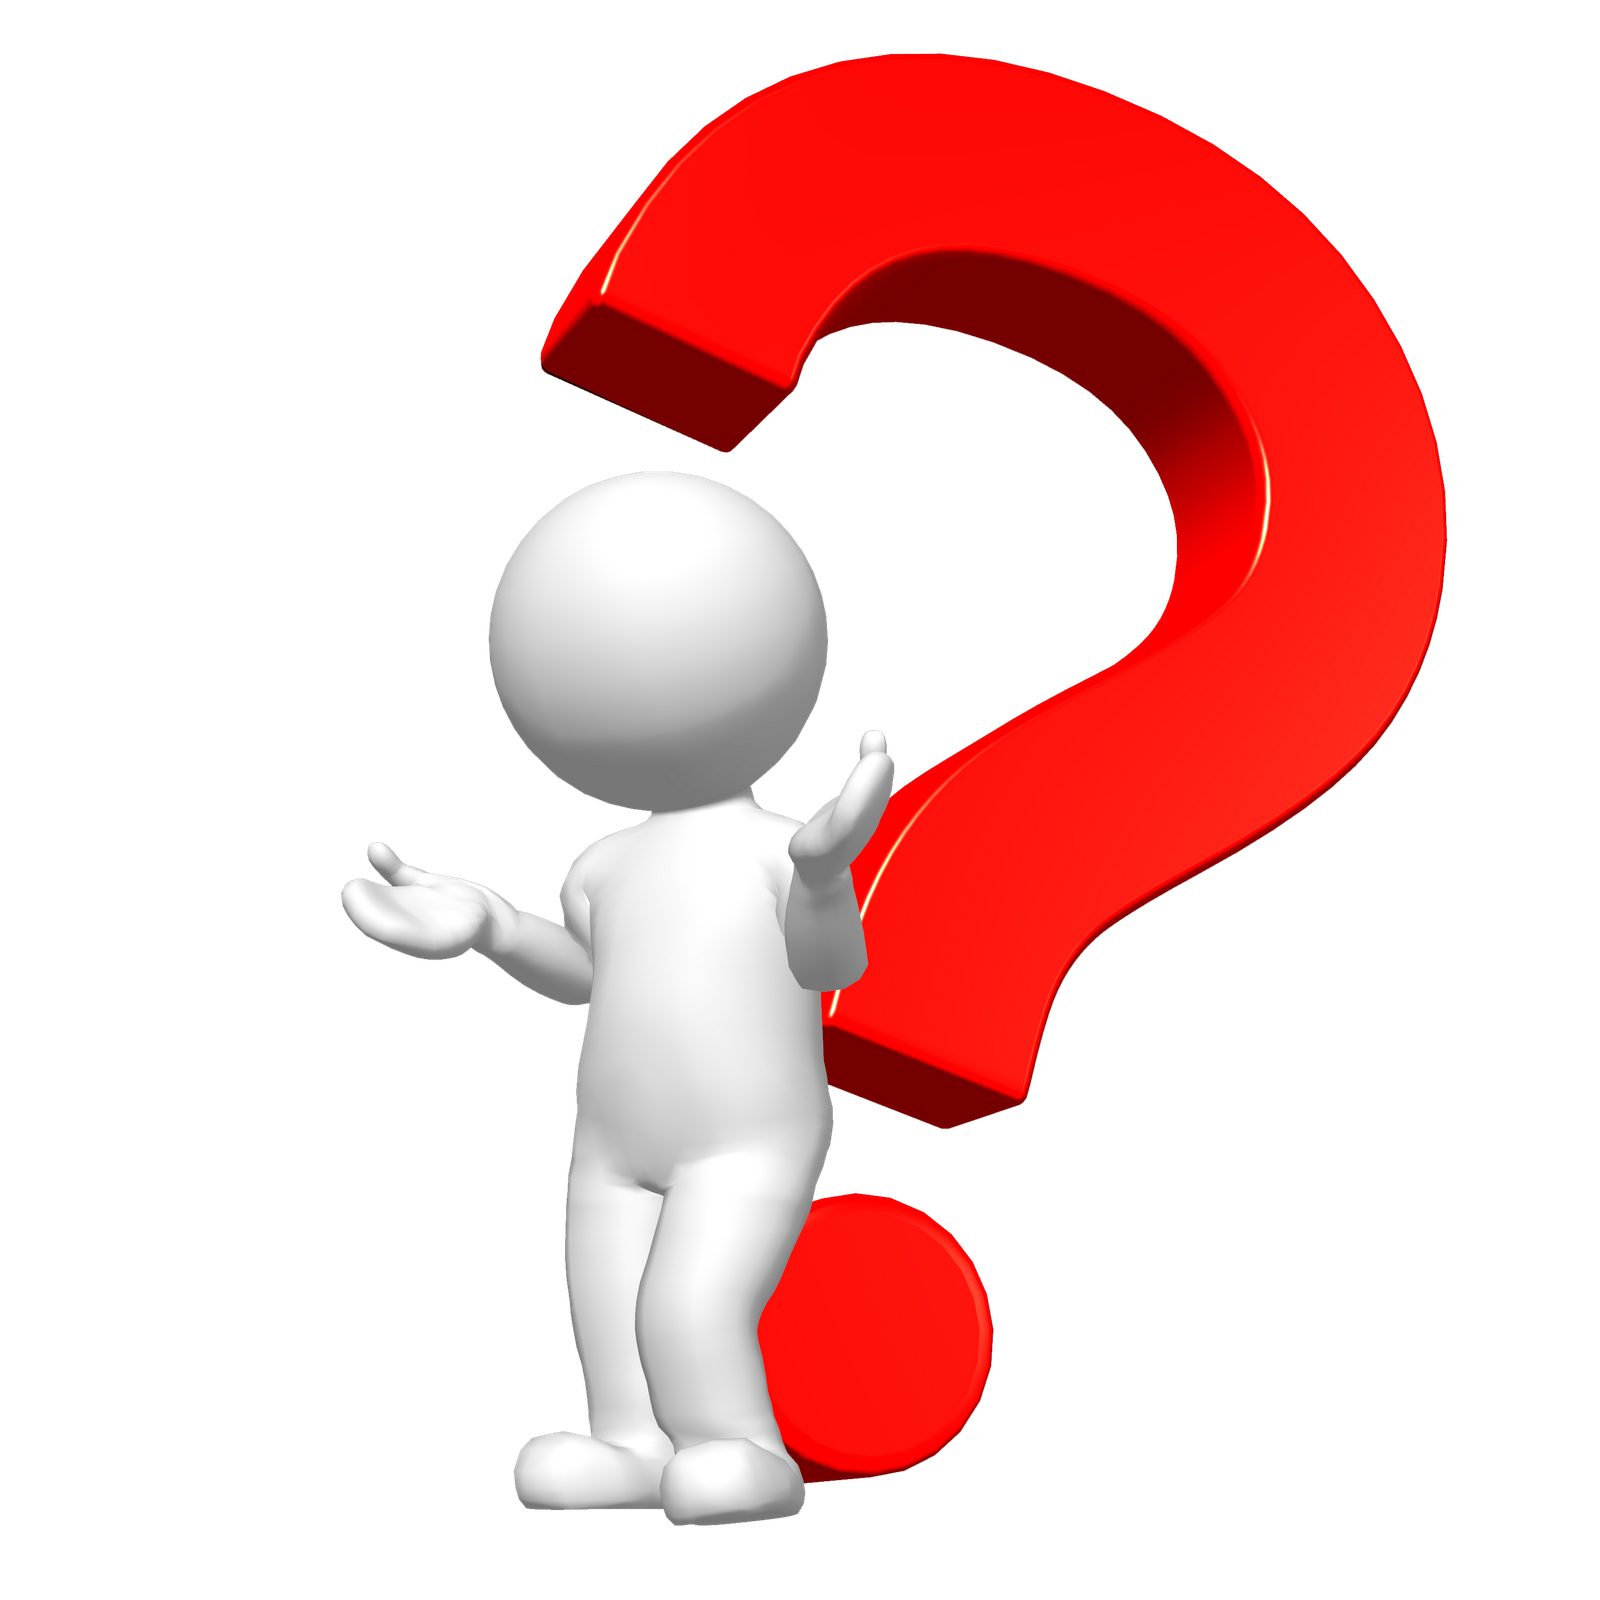 microsoft clipart question mark - photo #36